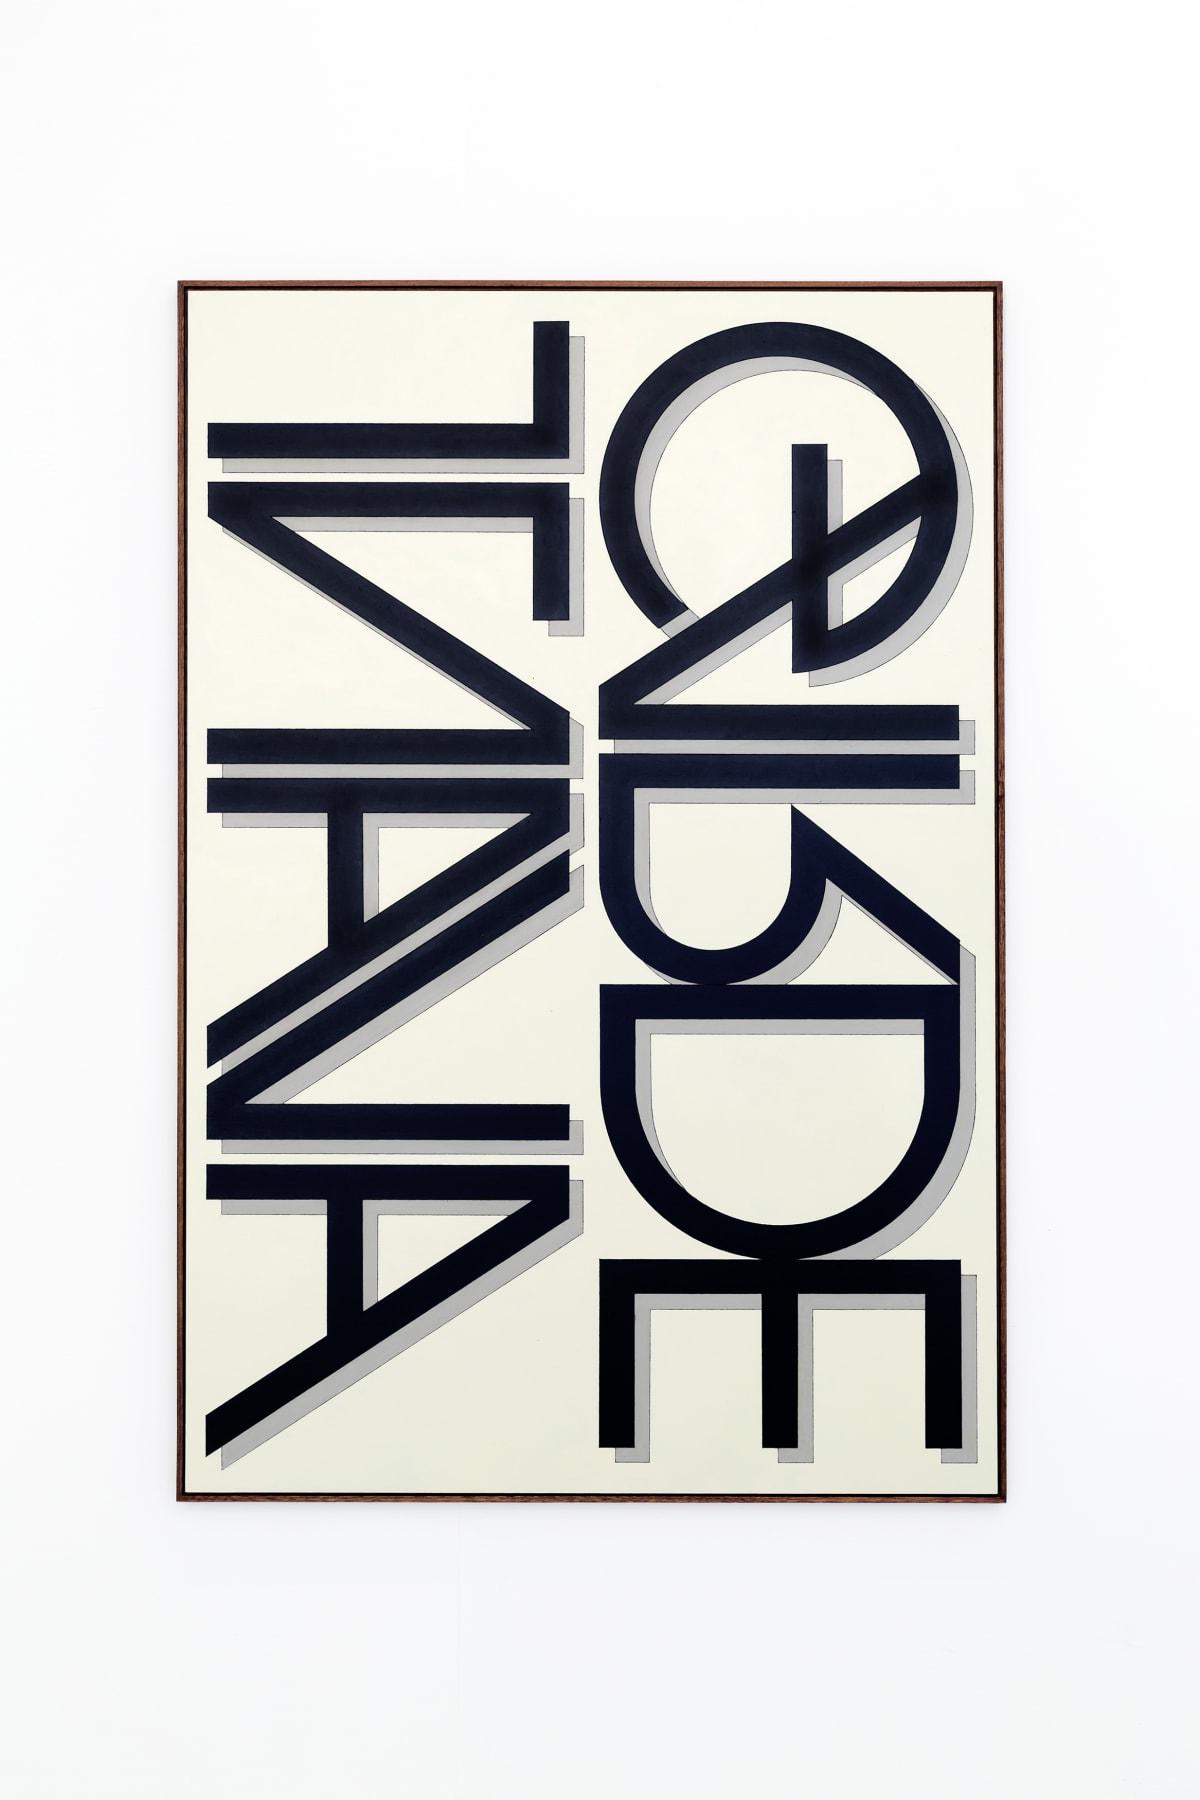 Thomas Raat, Avant Garde, 2019